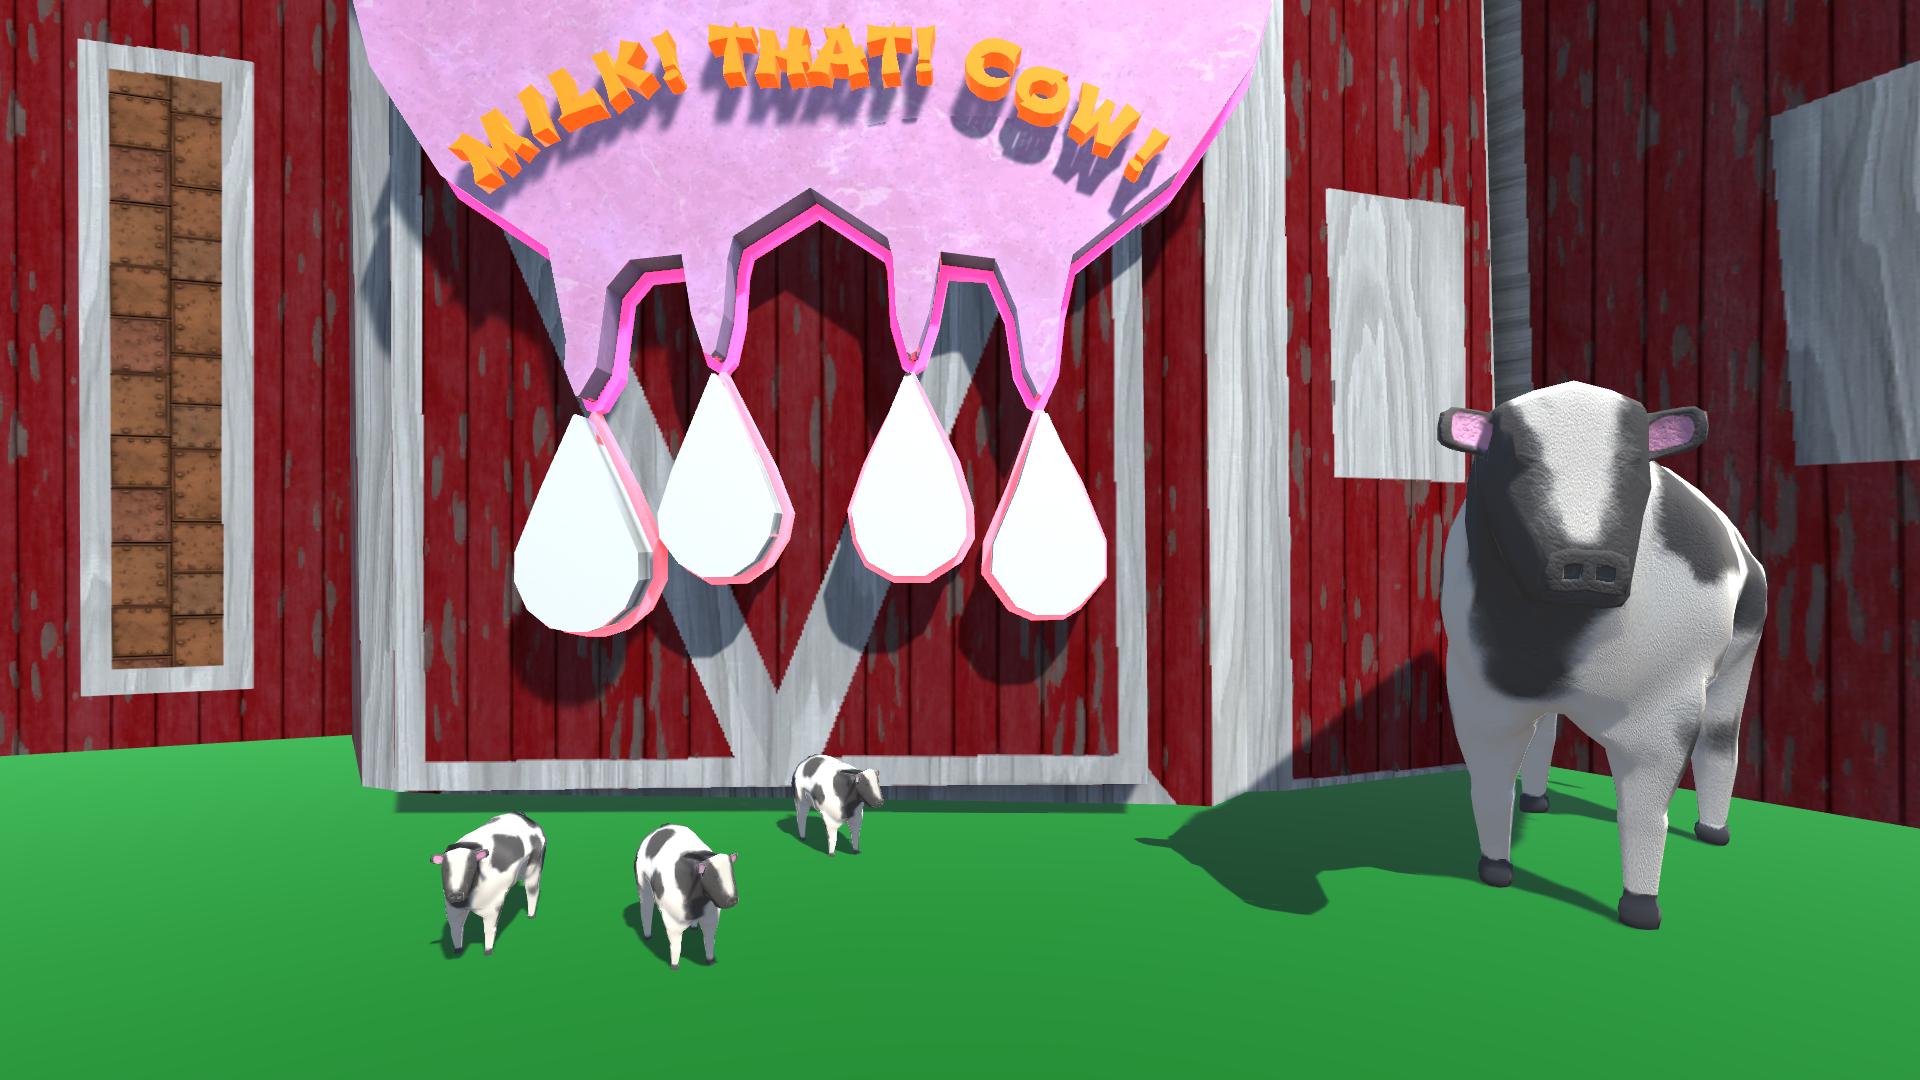 Milk That Cow!